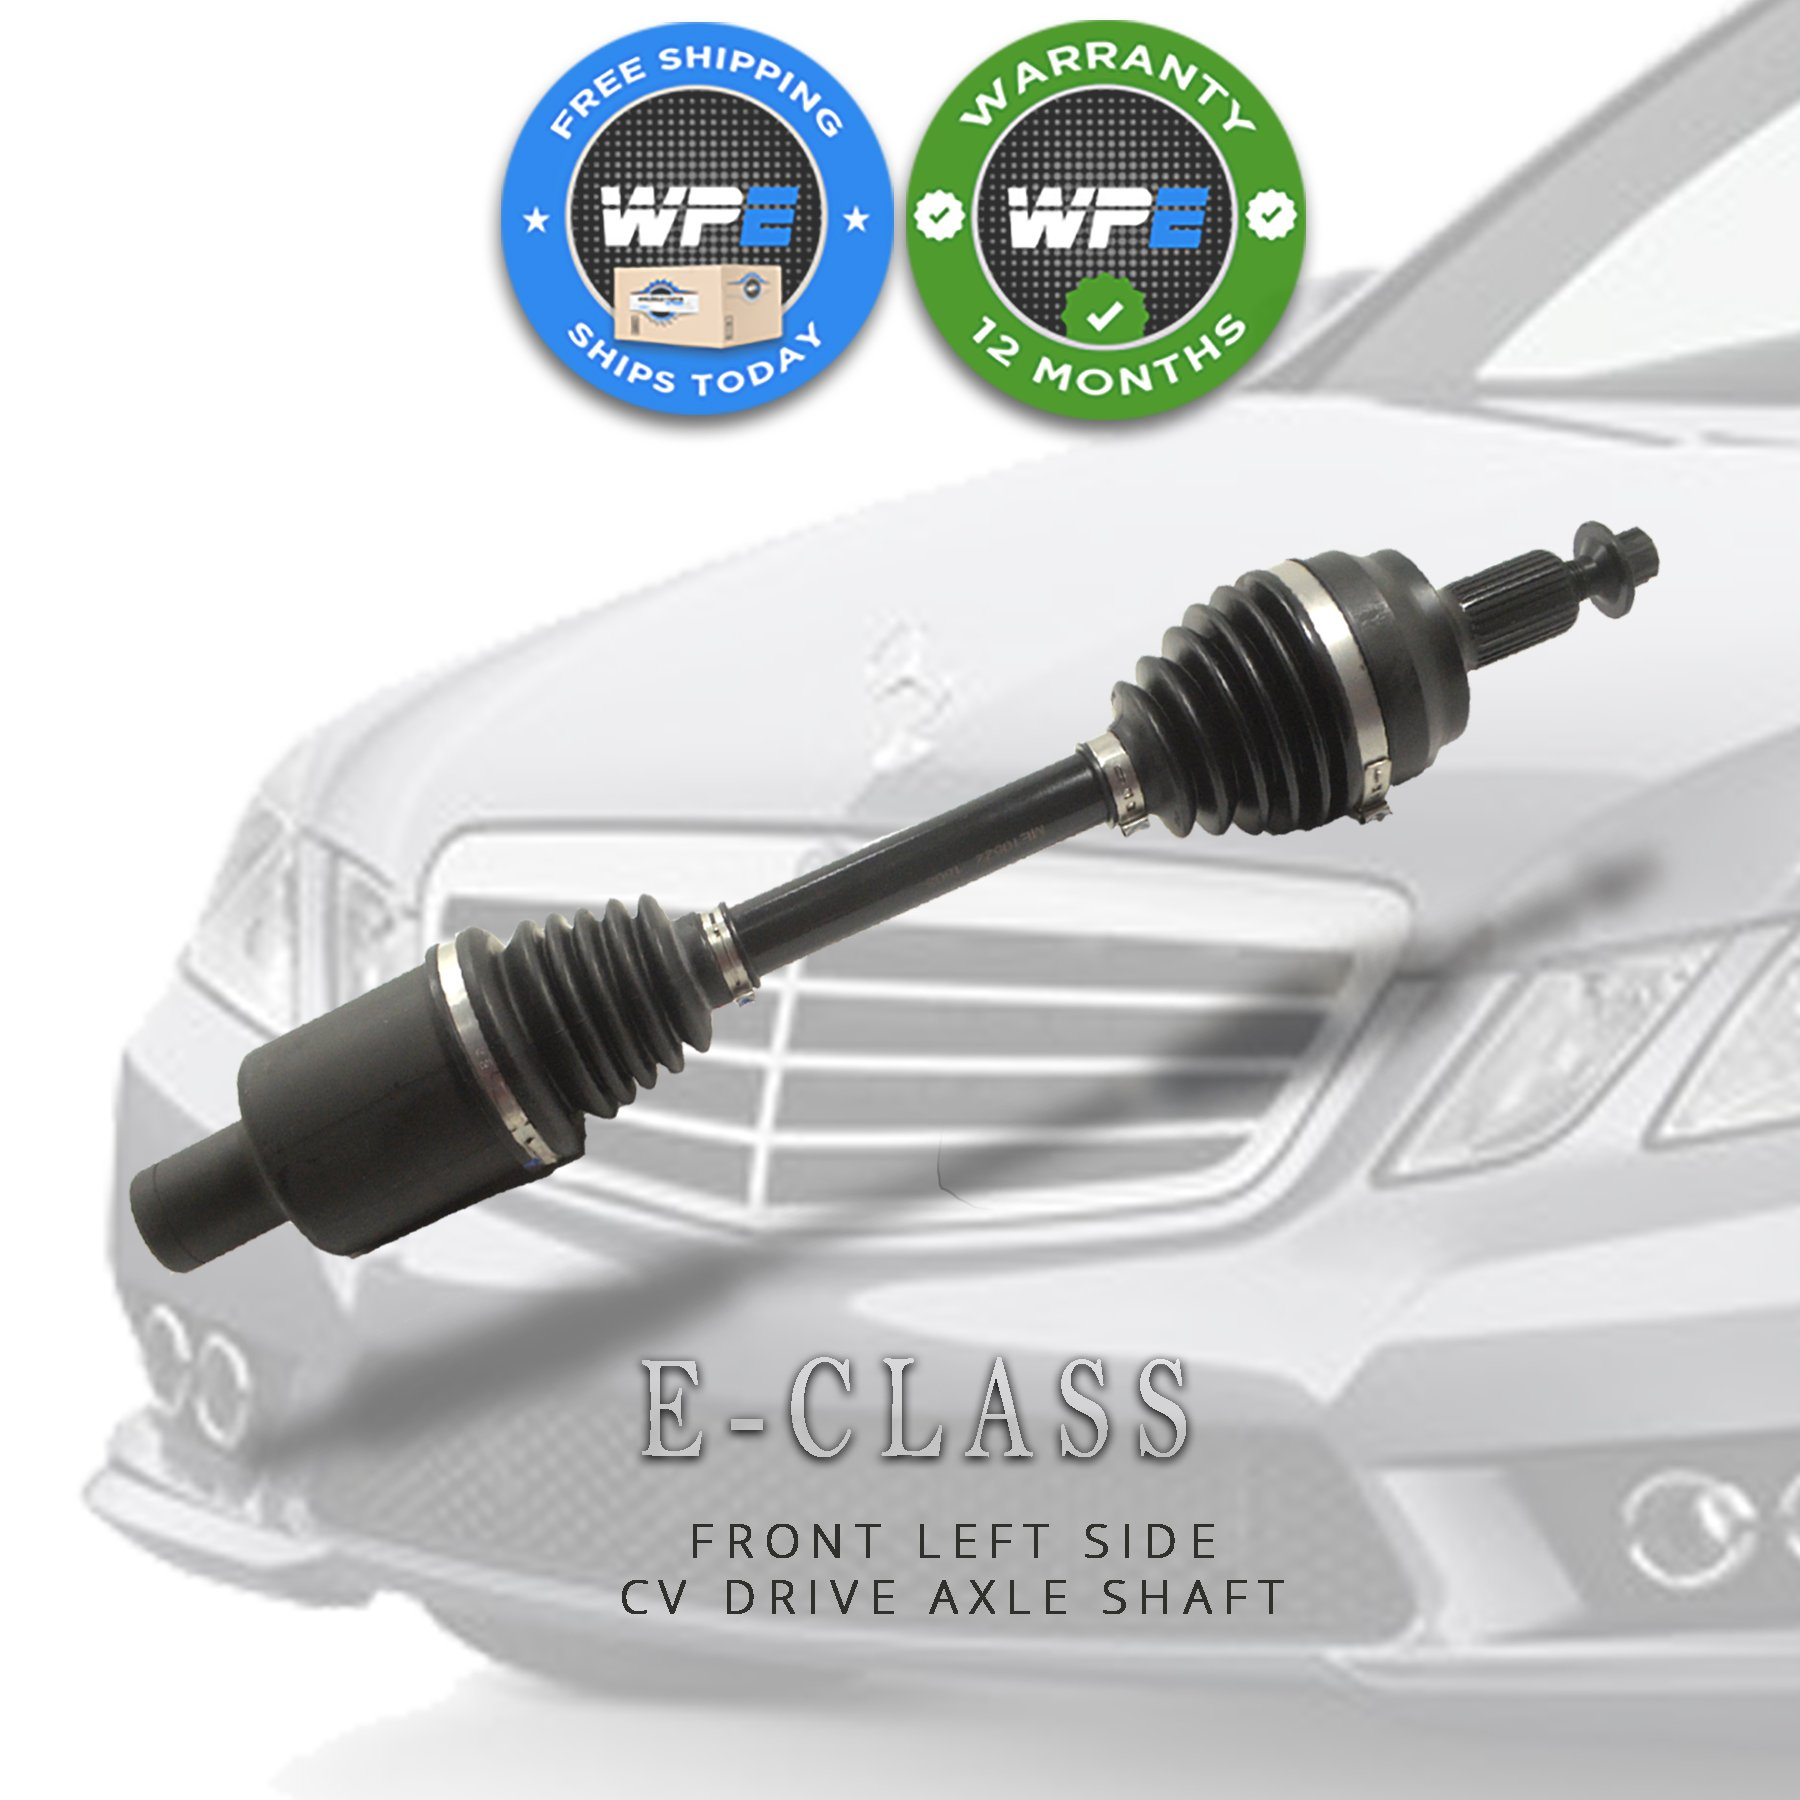 2013 - 2017 Mercedes E Class Coupe *NEW* Front Left CV Drive Axle Shaft  Assembly E350 E400 (Part Number 2043301300) - Wholesale Parts Express